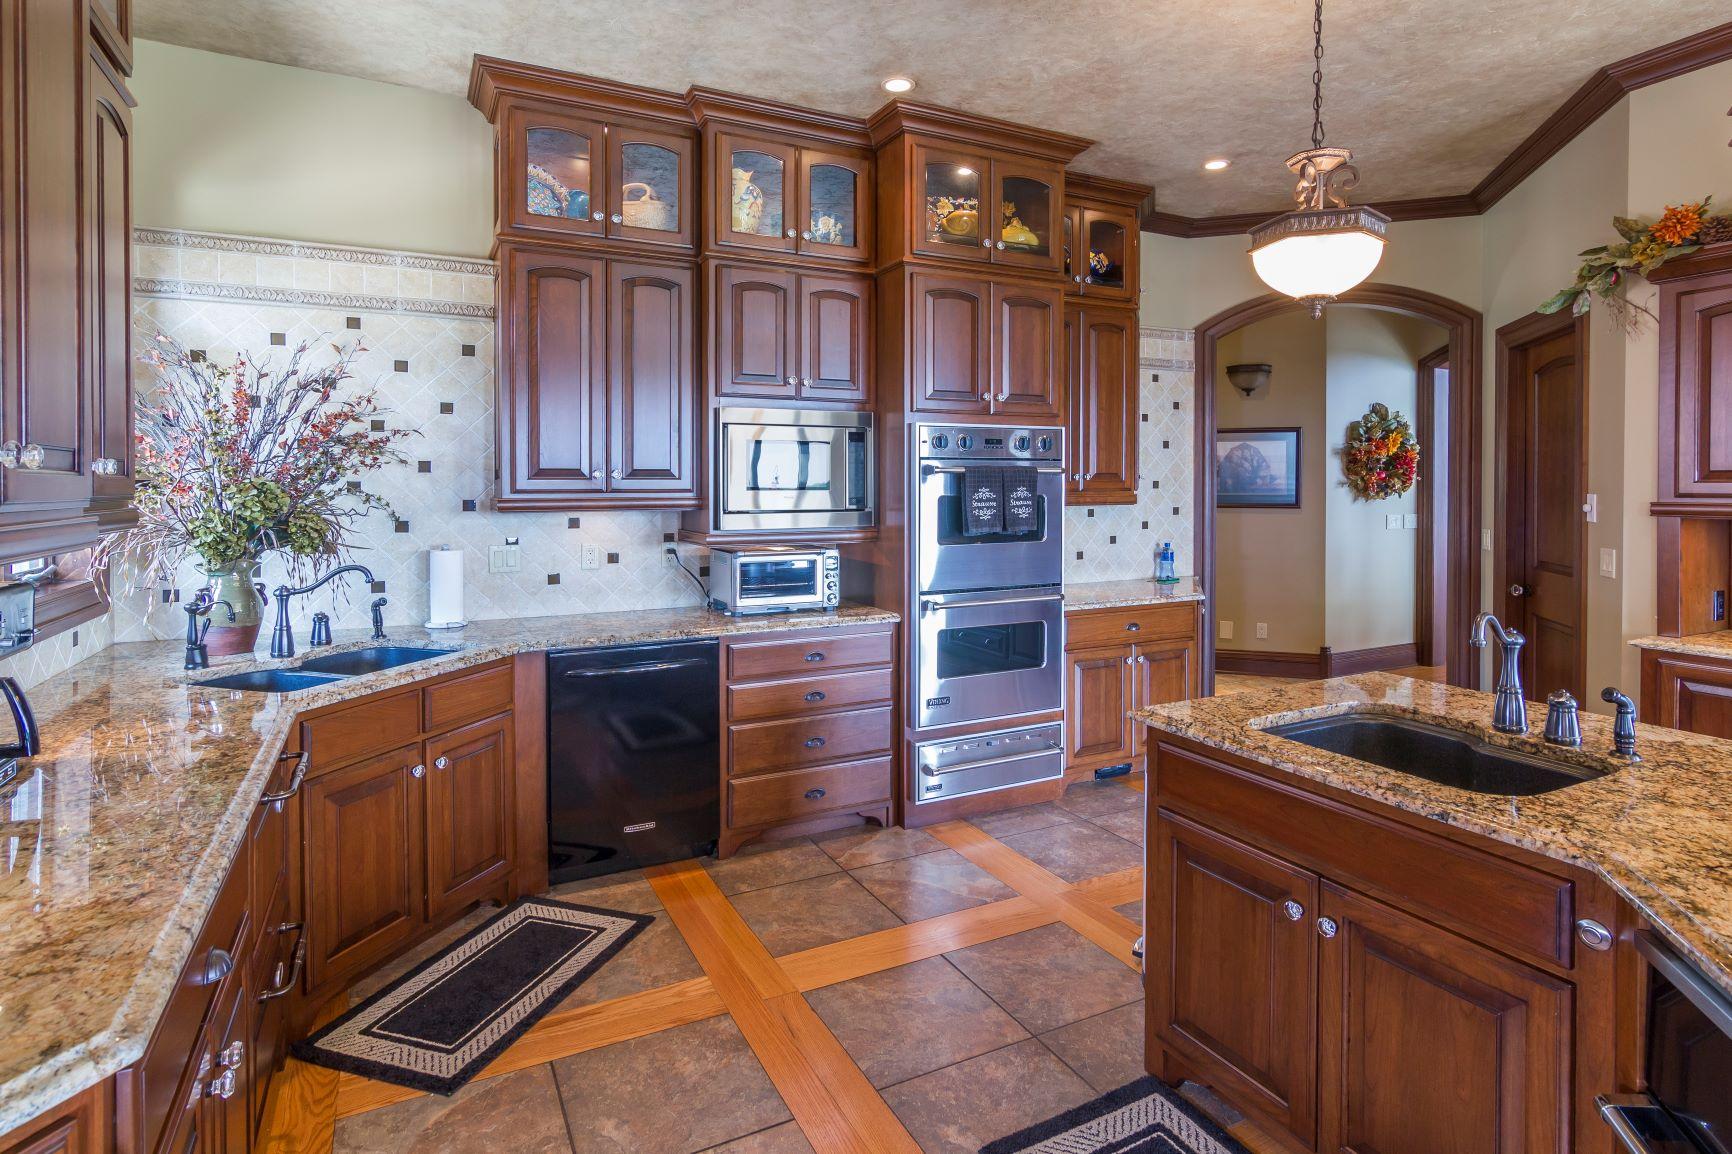 Southwoods kitchen1.jpg